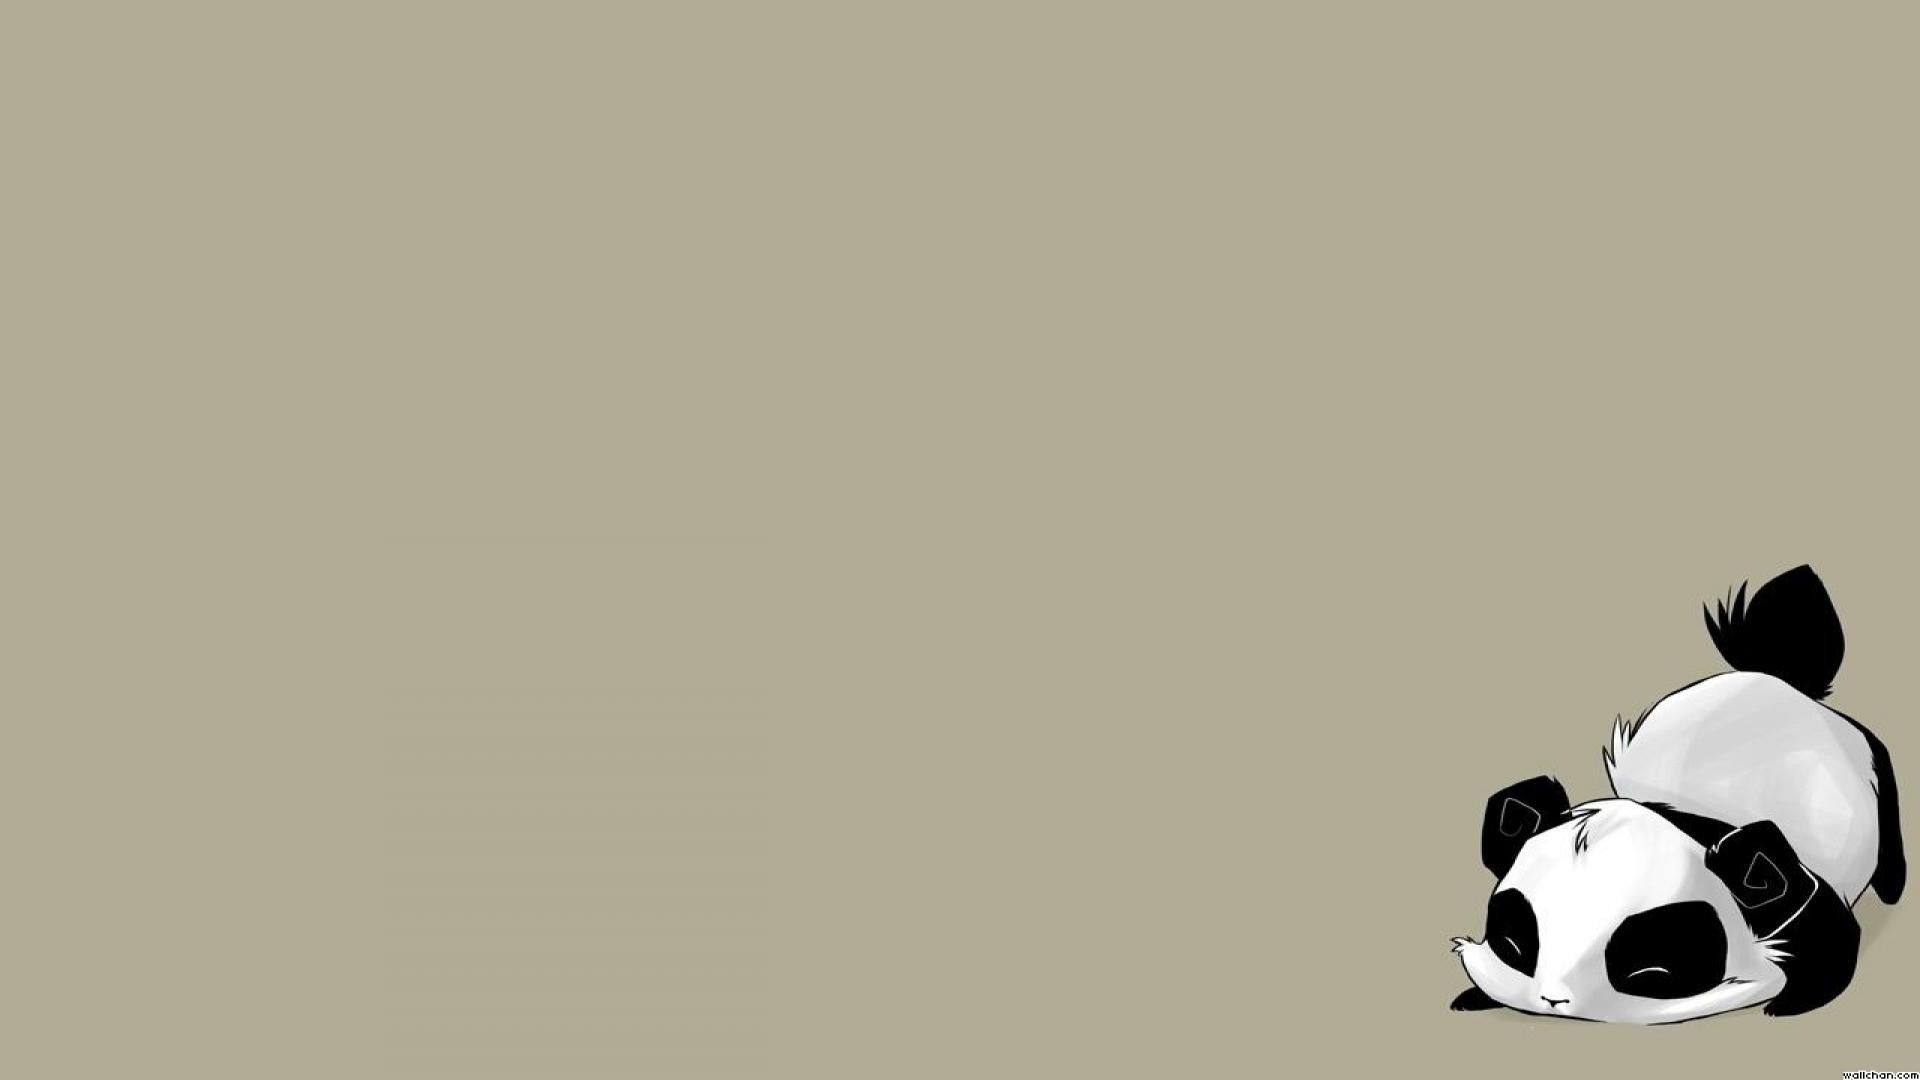 Res: 1920x1080, Awesome Cute Cartoon Animals Desktop Wallpaper Collection - cute panda  wallpaper hd for desktop